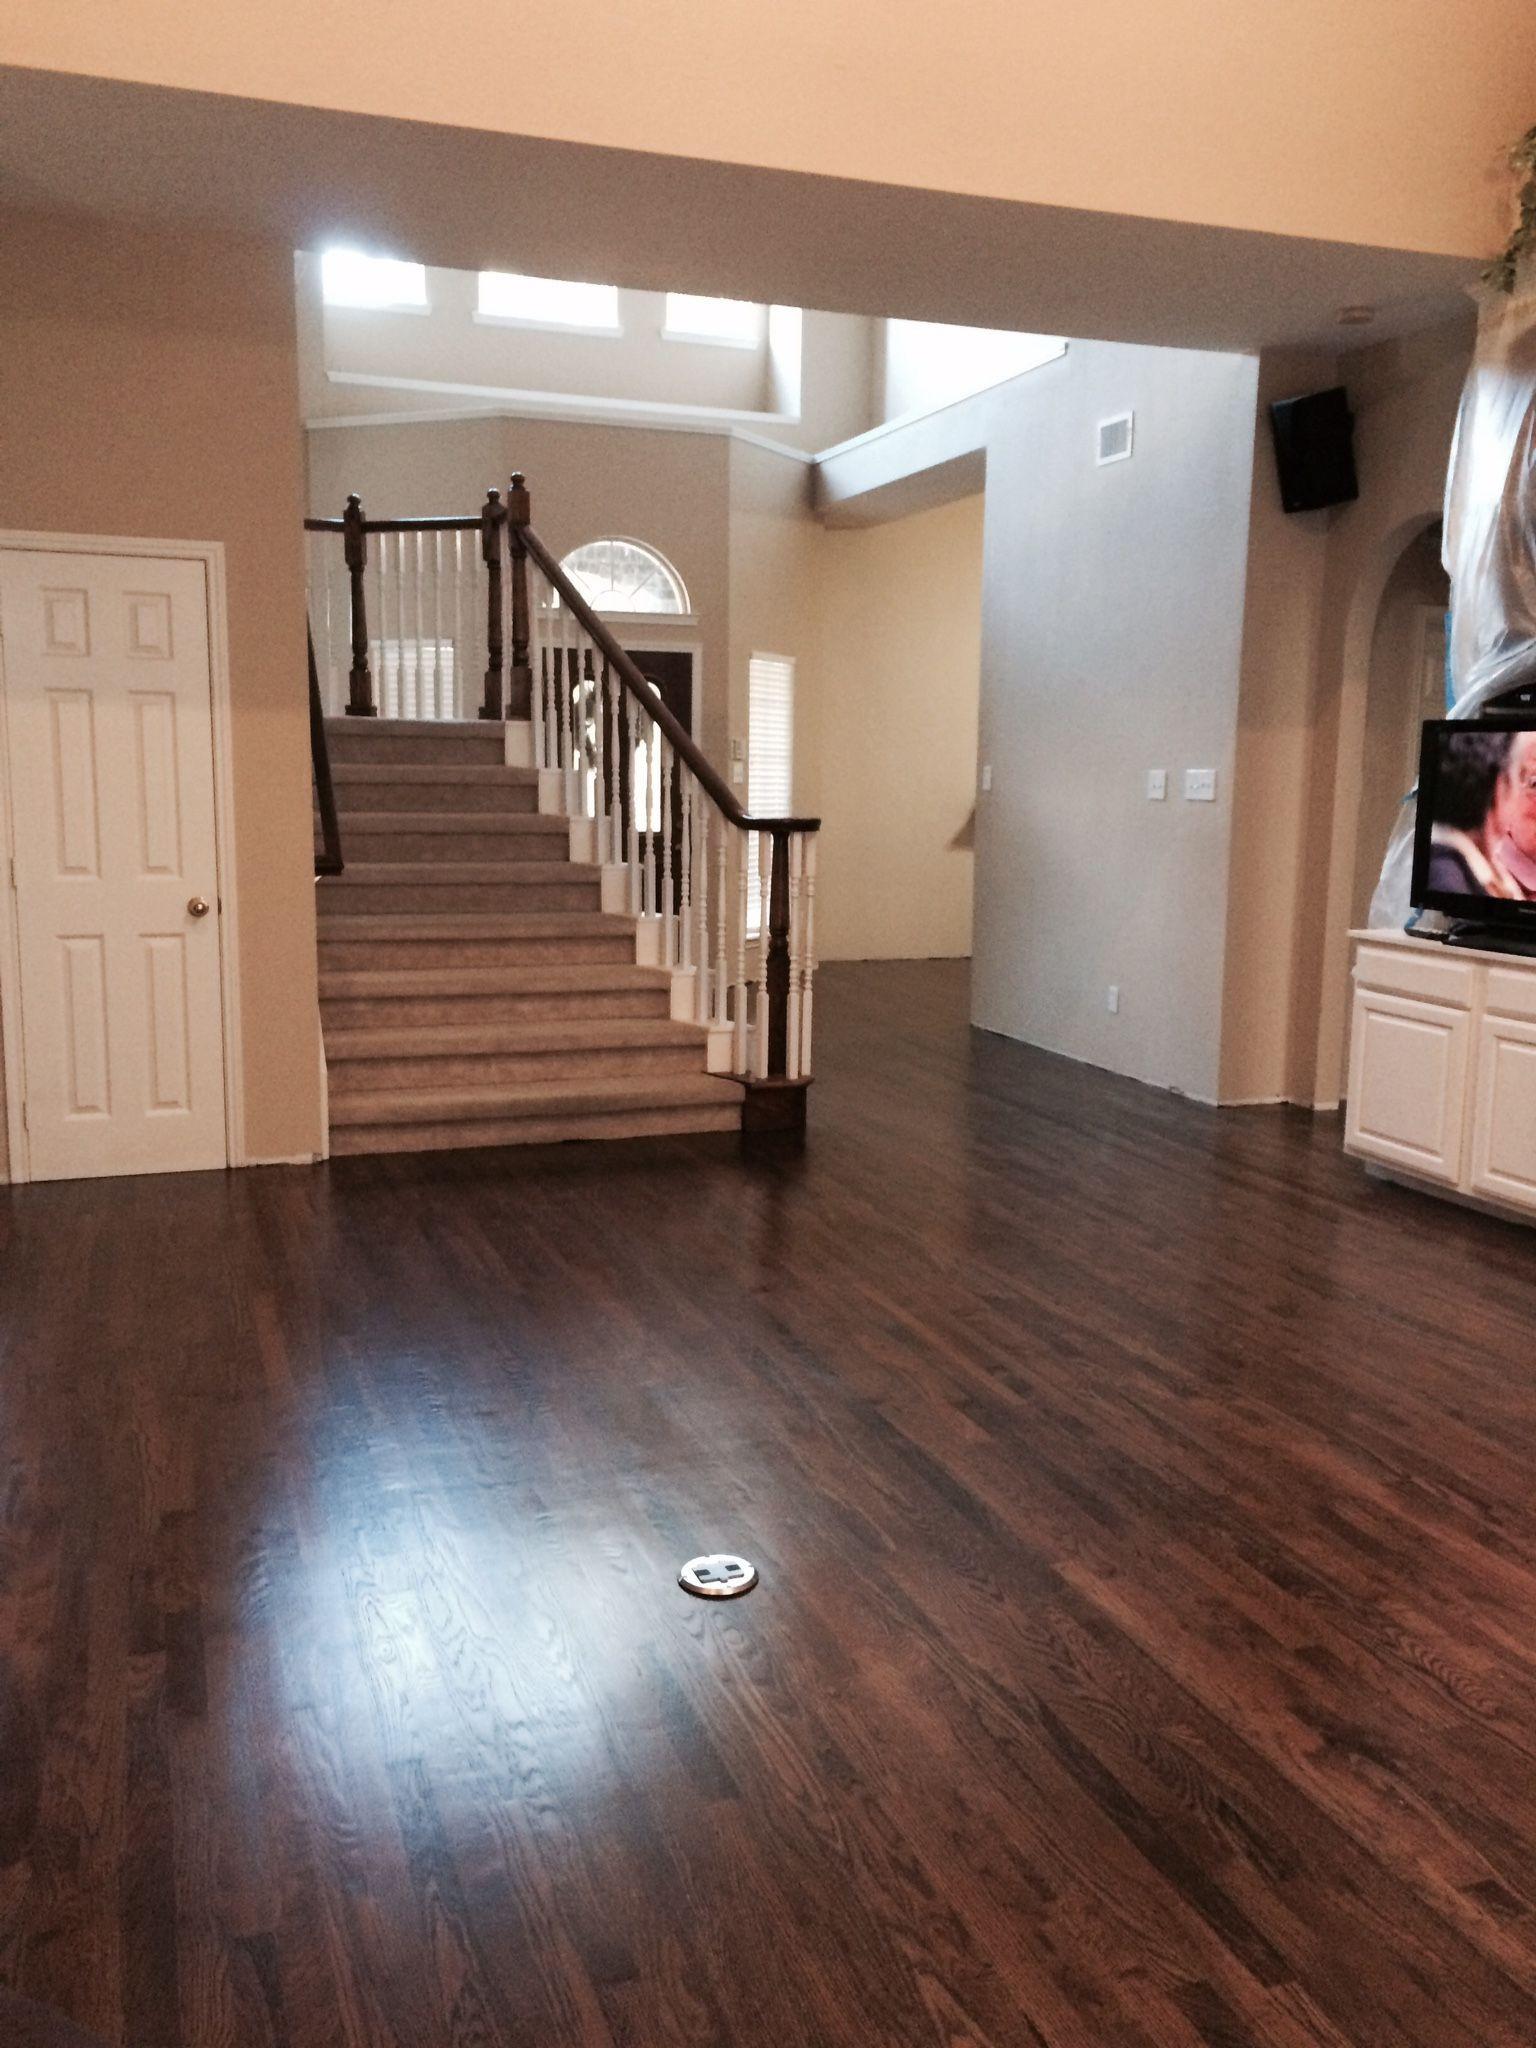 Discount Hardwood Flooring Mn Of Dark Walnut Stain On White Oak Hardwood Remodel 1floors In 2018 with Dark Walnut Stain On White Oak Hardwood Walnut Hardwood Flooring Hardwood Floor Stain Colors